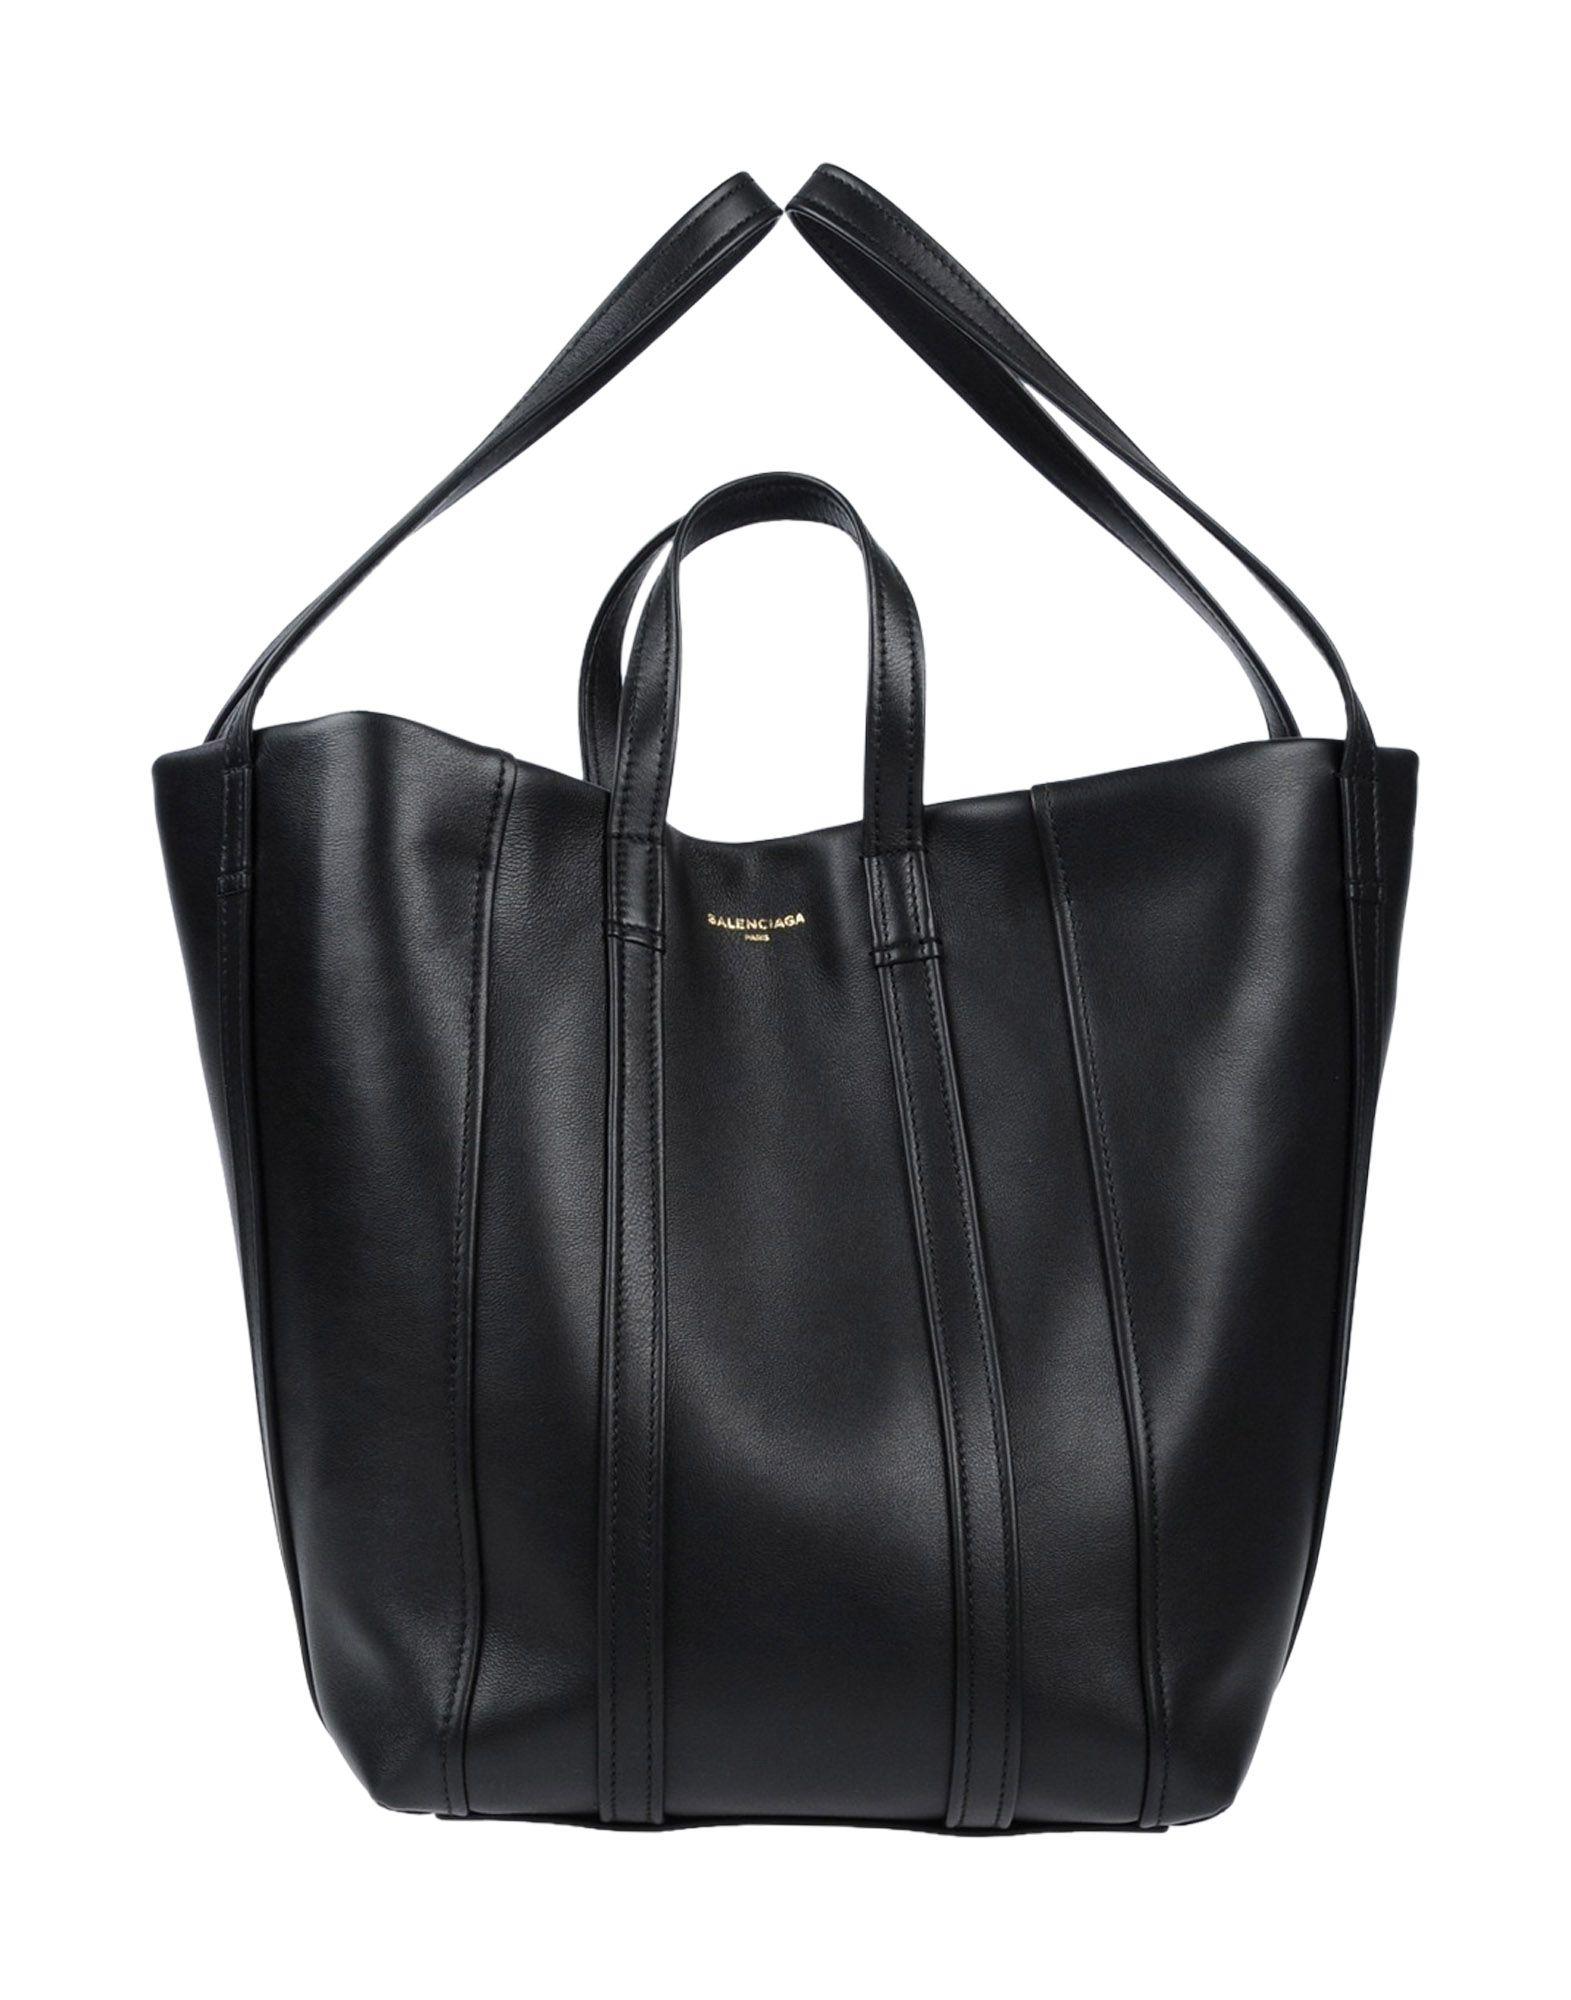 Borsa A Spalla Balenciaga Donna - Acquista online su